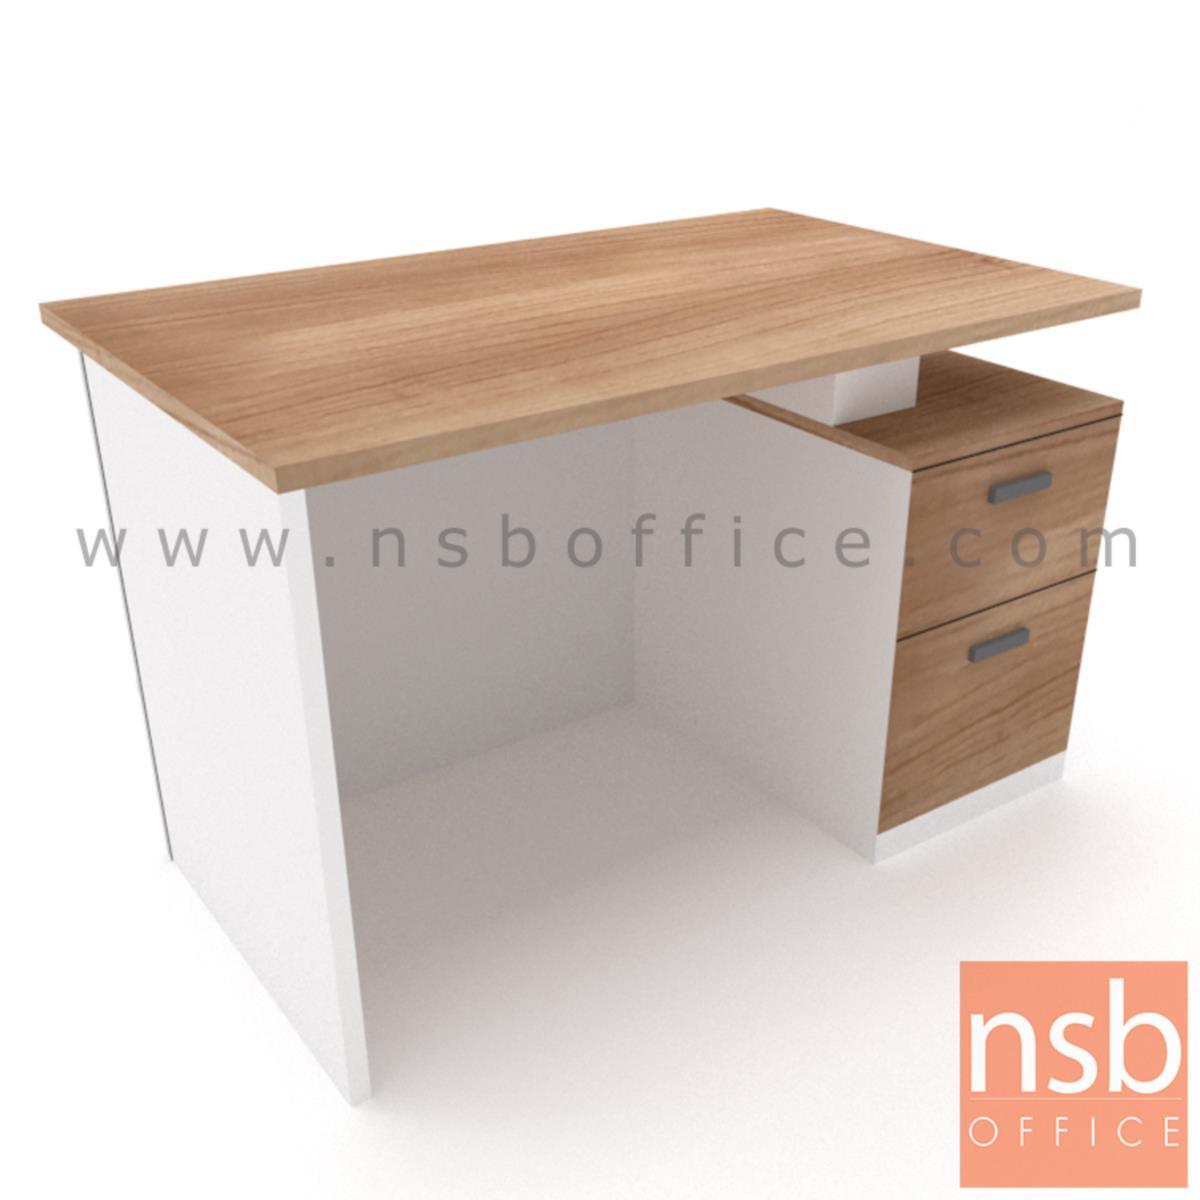 A13A197:โต๊ะทำงาน 2 ลิ้นชัก  รุ่น Plumcot (พลัมคอต) ขนาด 150W cm. พร้อมบังตาไม้ปิดเต็มแผ่น เมลามีน